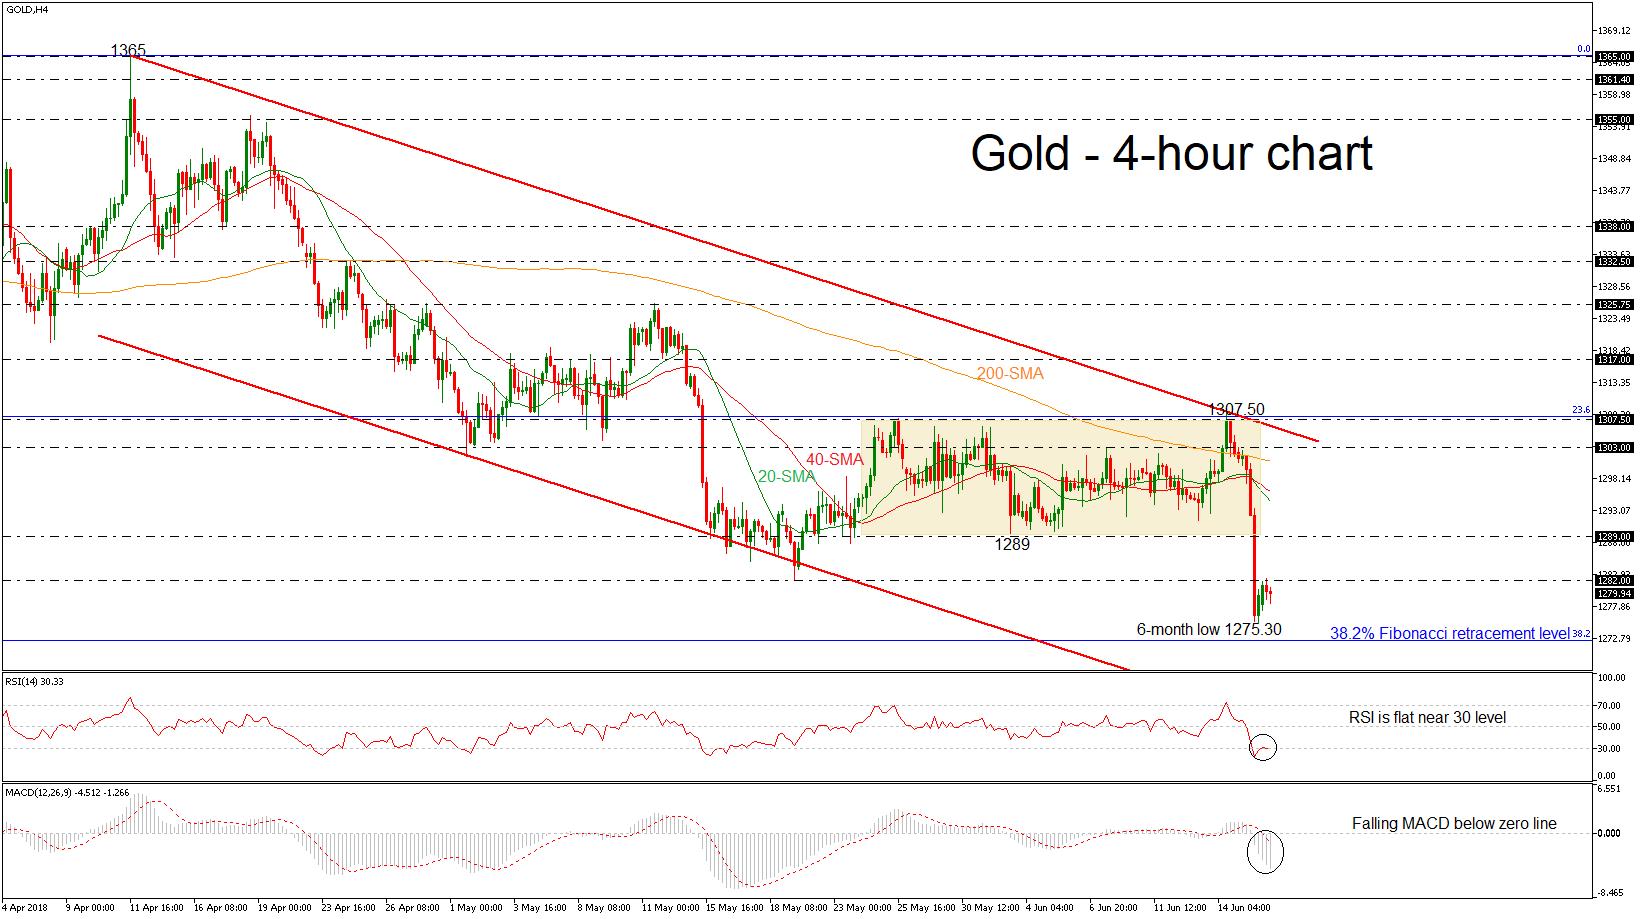 Gold 18/06/18 | EconAlerts